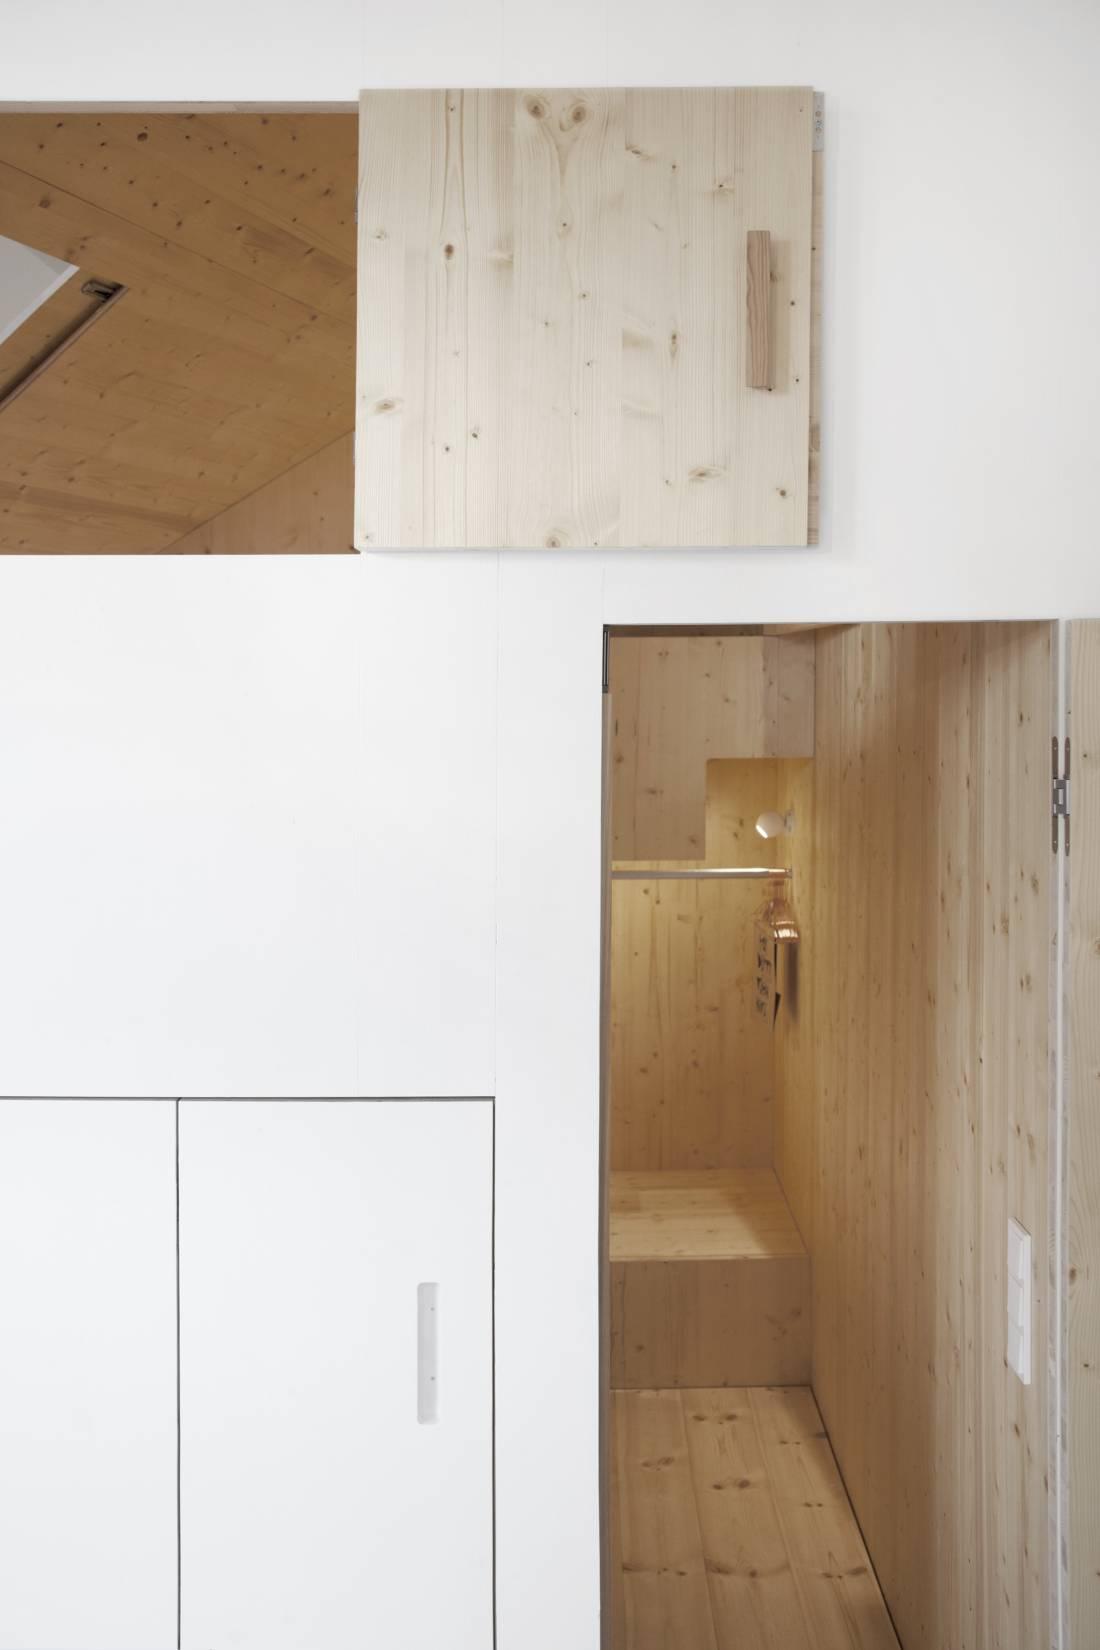 Room-304_Sigurd-Larsen_Michelberger-Hotel_Architecture-Danish-design-berlin_photo-Rita-Lino-2-550x825@2x.jpg